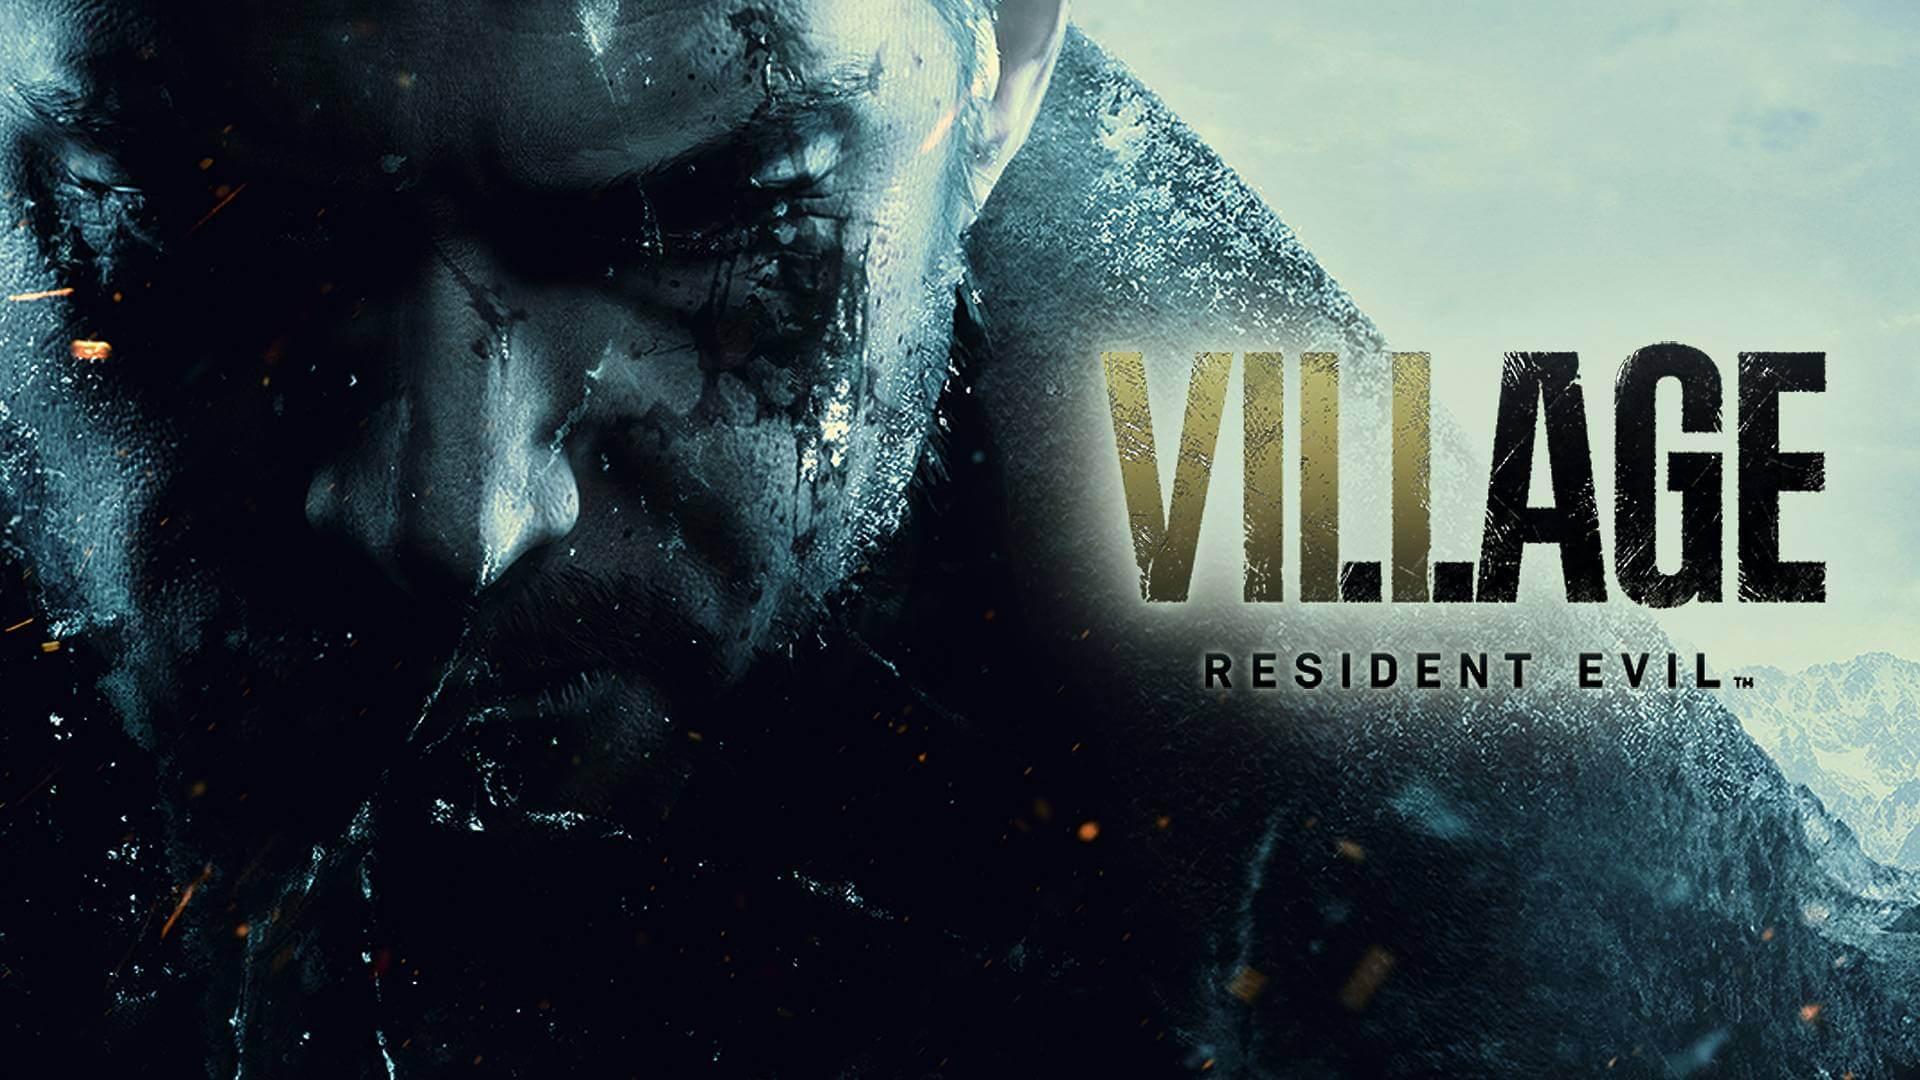 Resident-evil-village-locandina